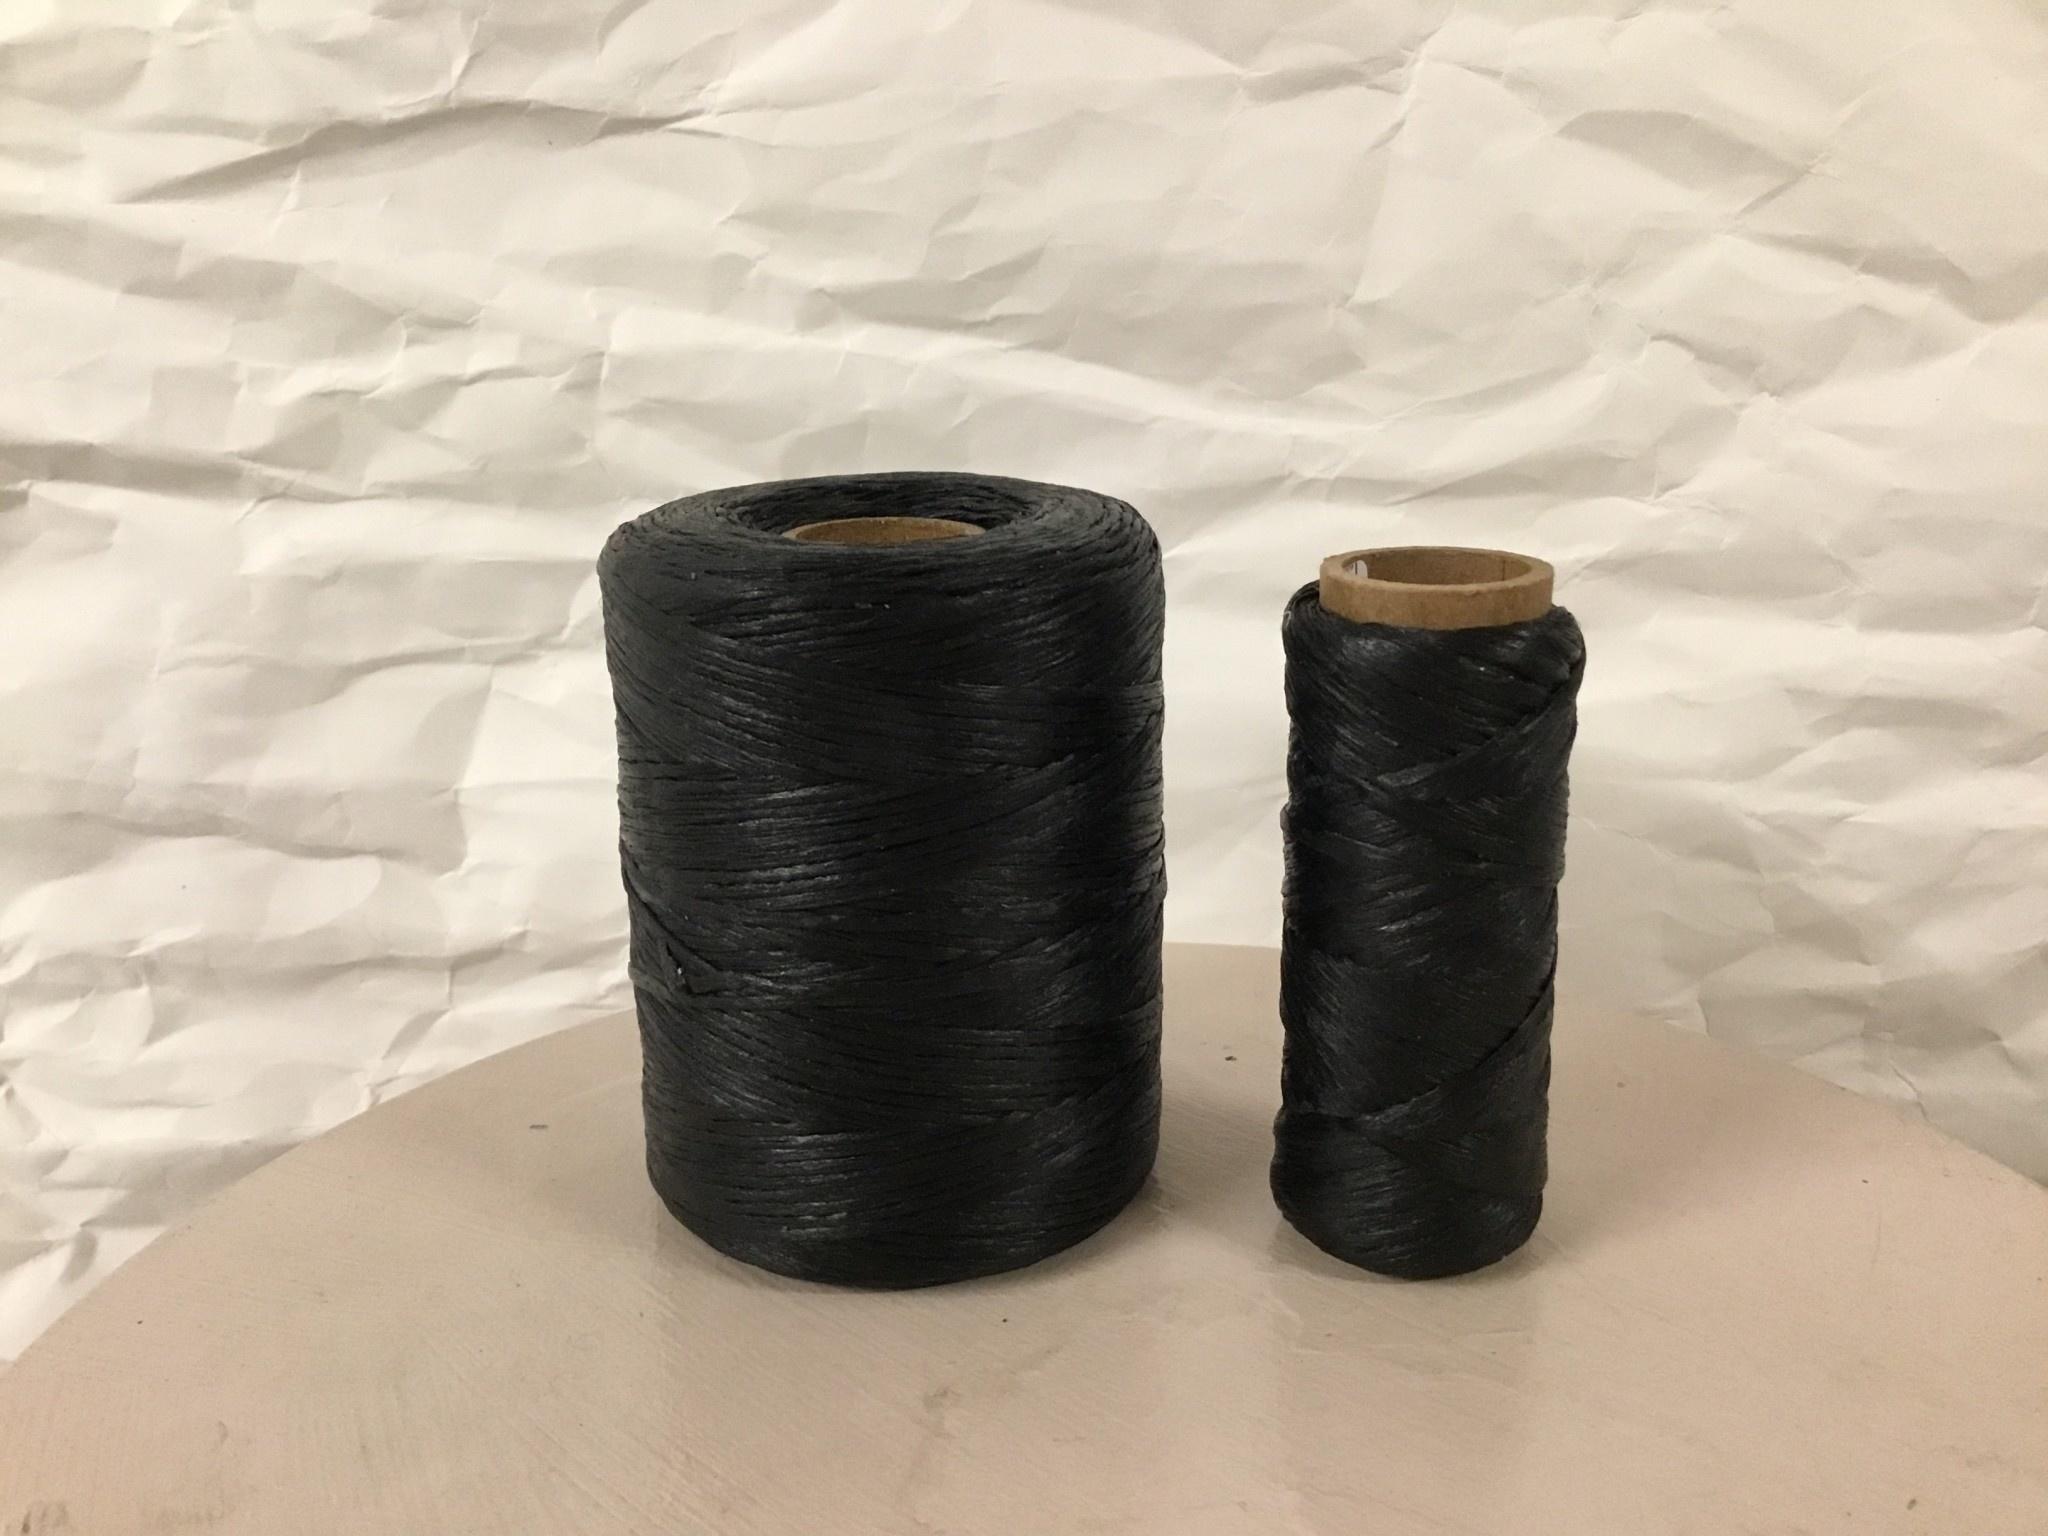 Black Natural Imitation Sinew 544 Yds 100% Polypropylene